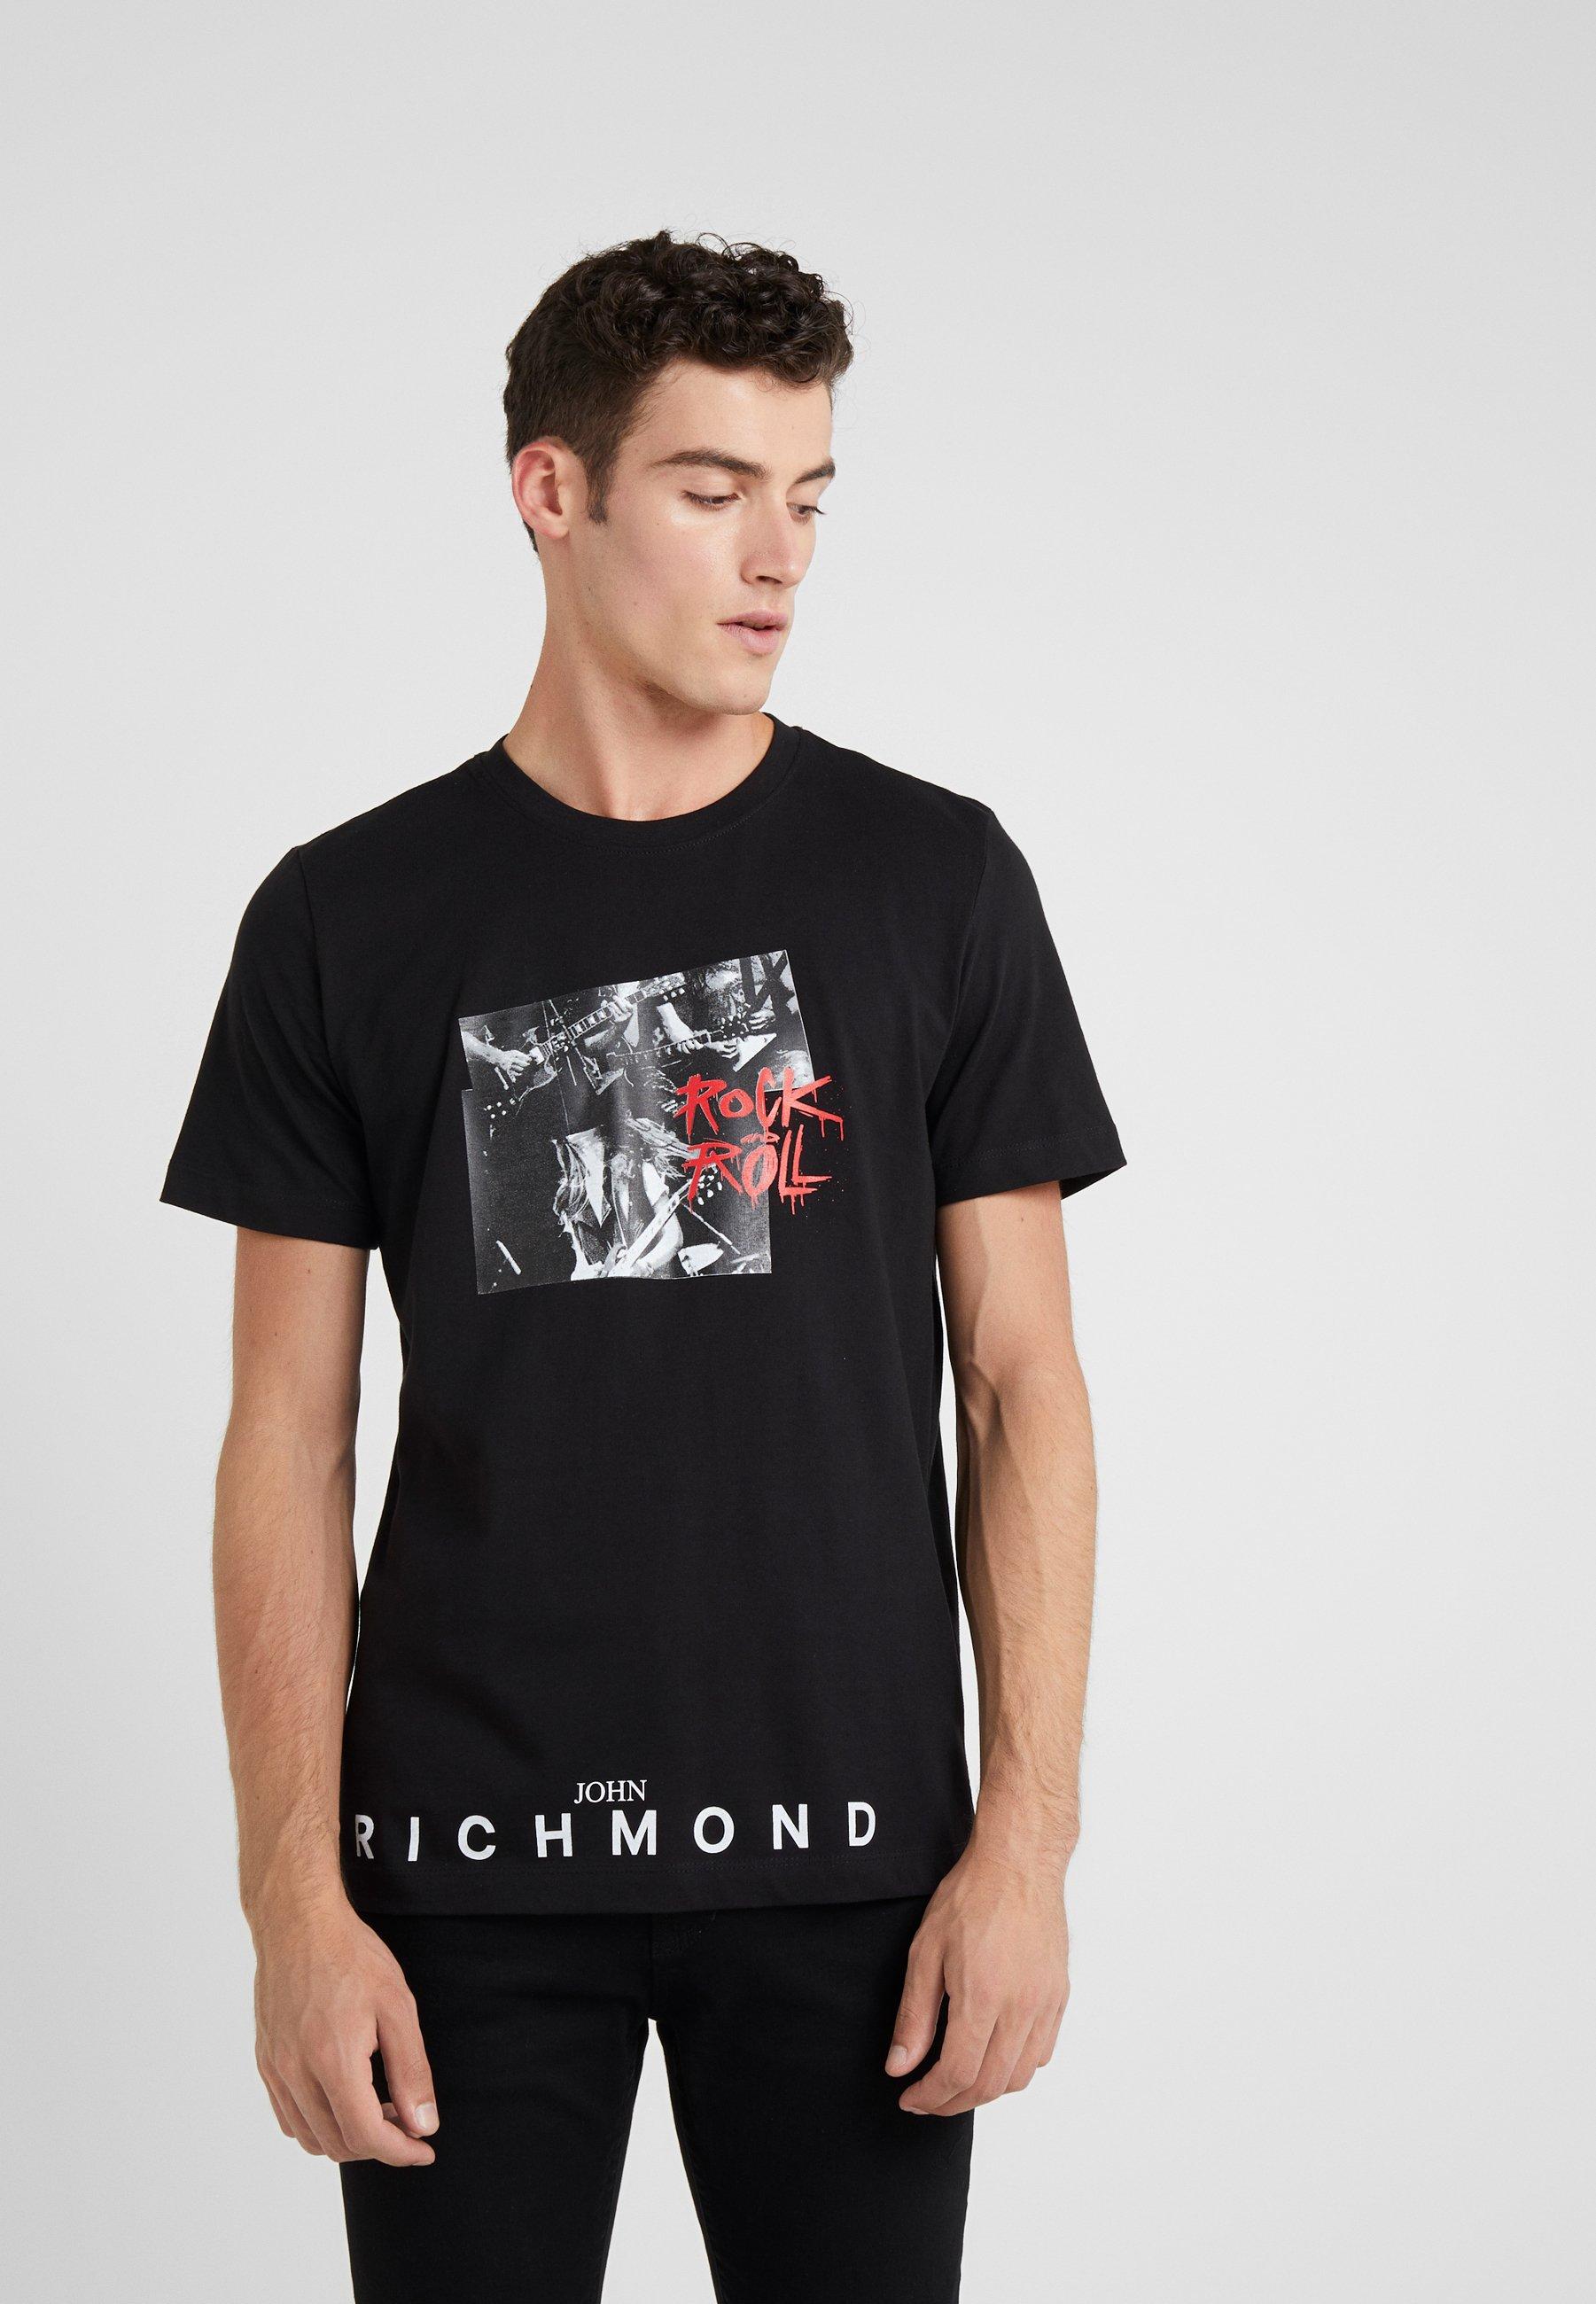 shirt T Richmond Richmond T ImpriméBlack John ImpriméBlack shirt John T5uK3lcFJ1